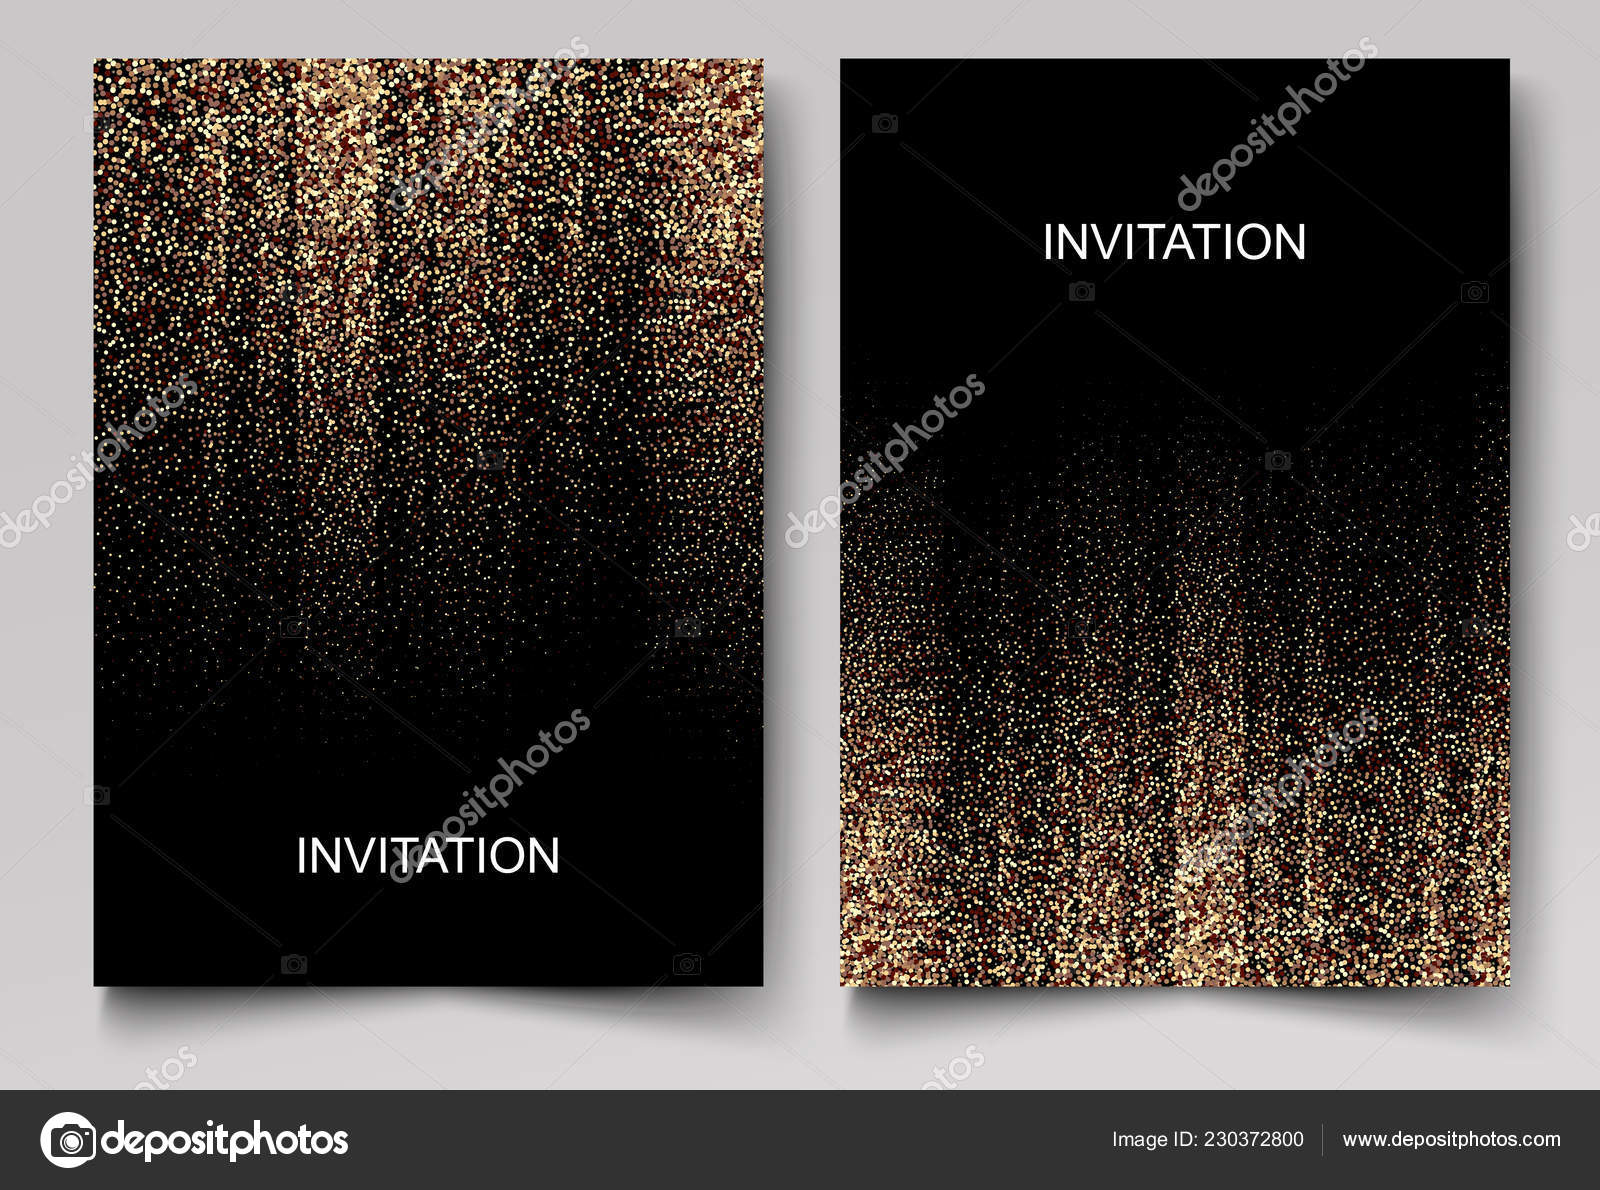 Set Wedding Invitation Cards Design Gold Confetti Black Background Vector Stock Vector C Vitles 230372800